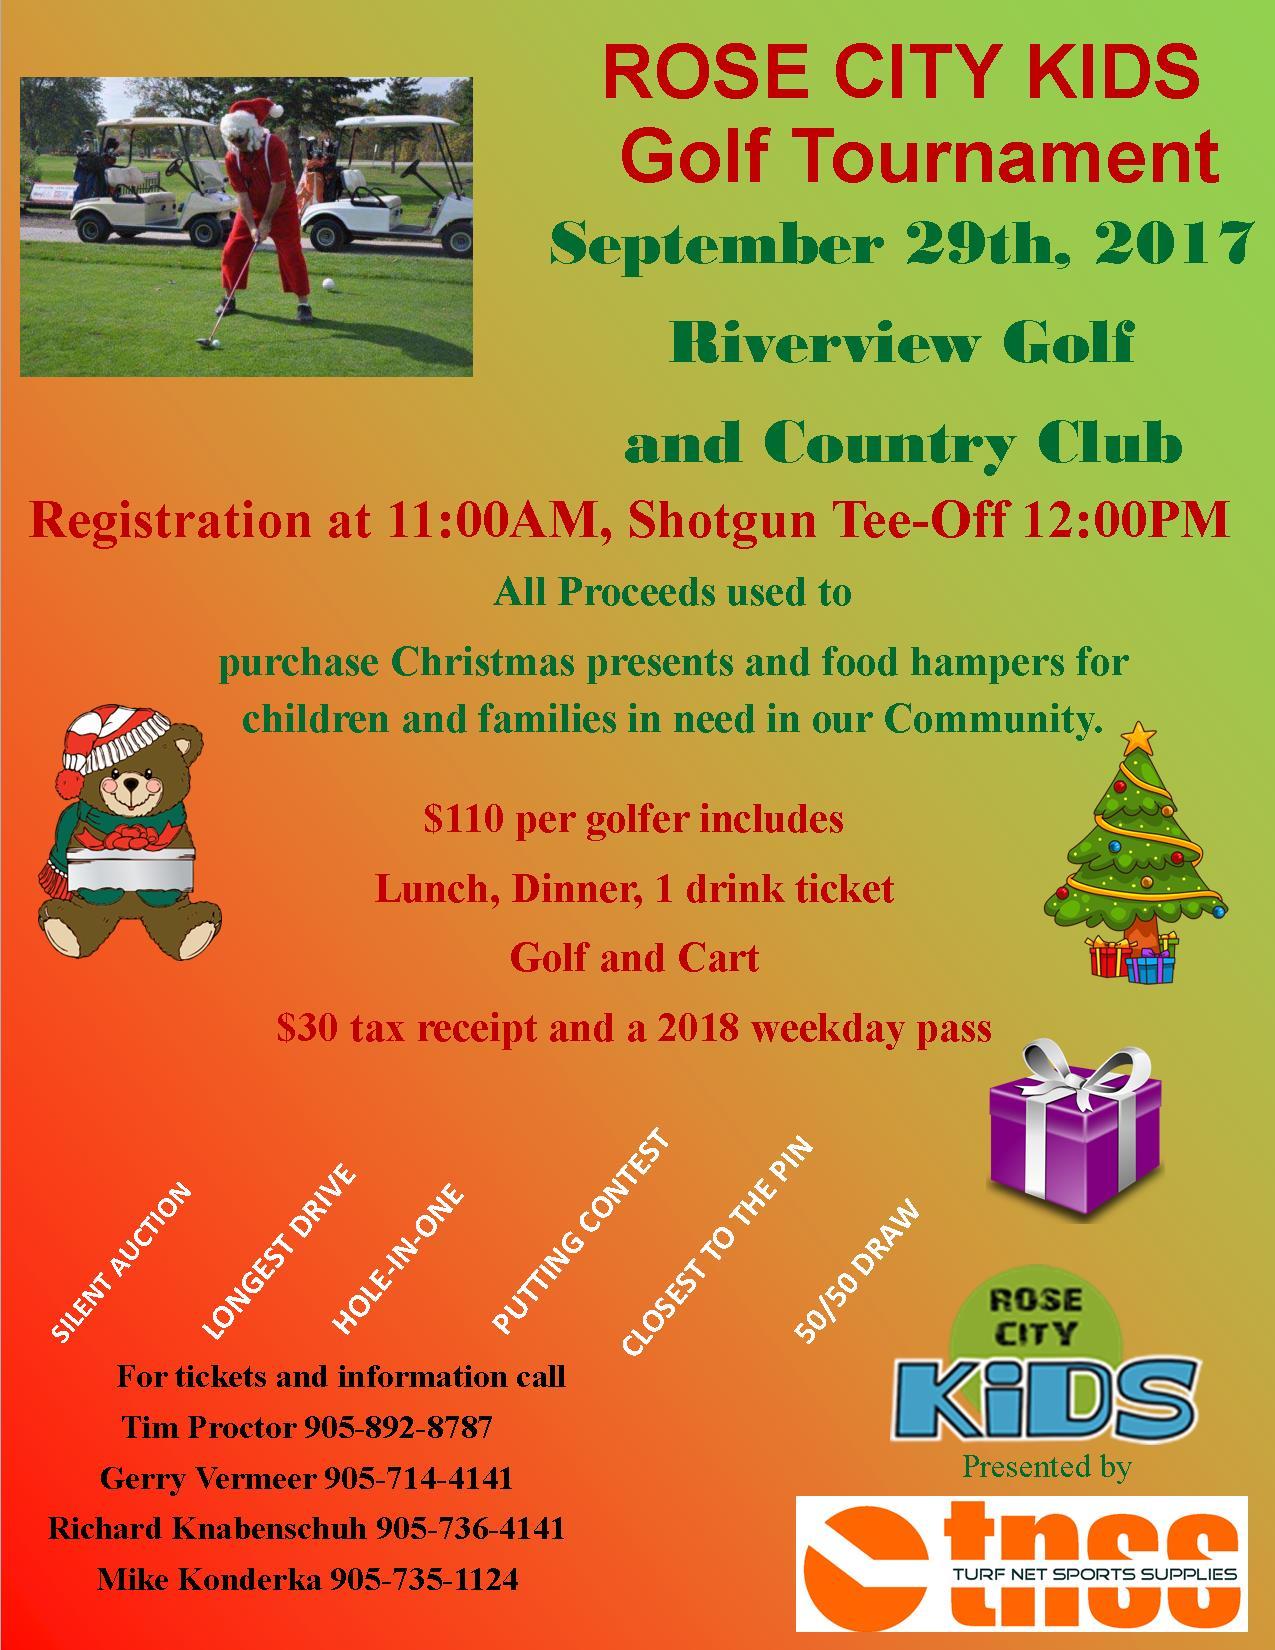 ROSE CITY KIDS Golf Tournament